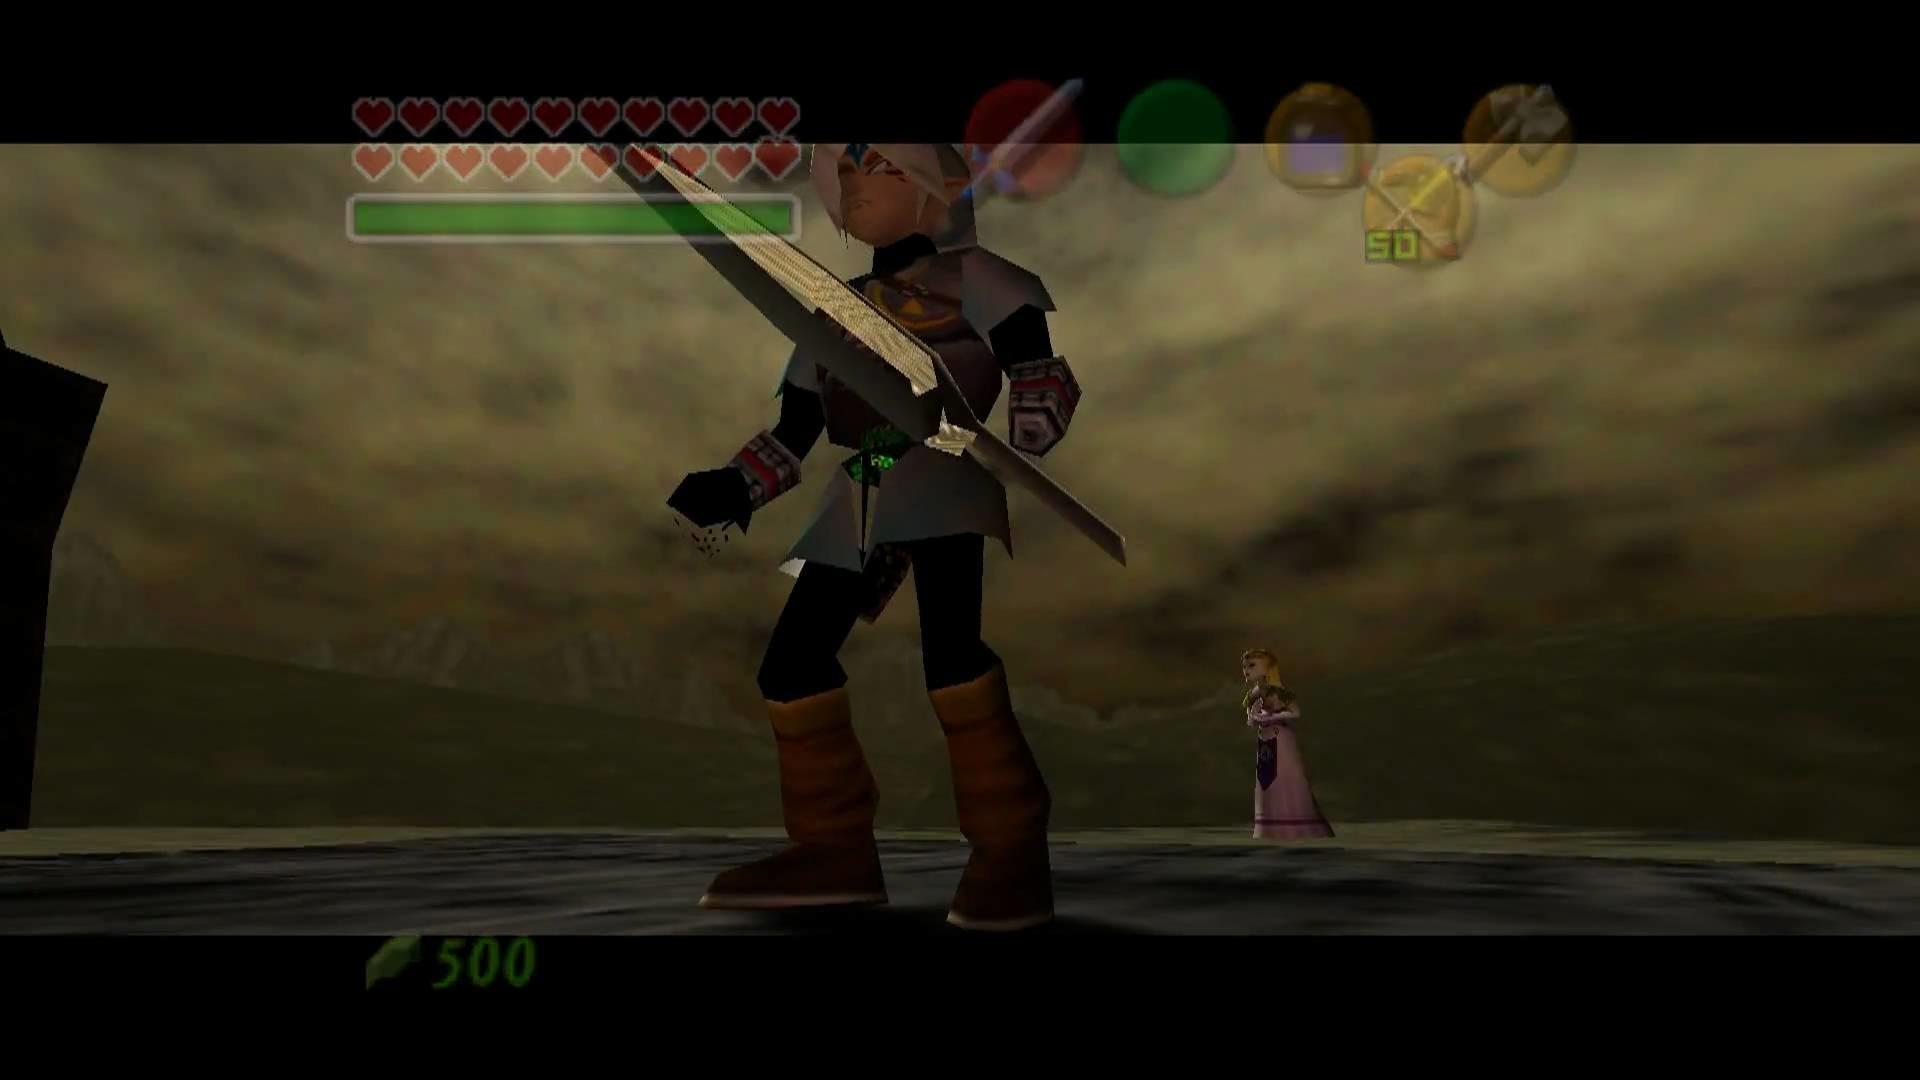 Fierce Deity vs Ganon in The Legend of Zelda: Ocarina of Time / Master  Quest True Widescreen – YouTube